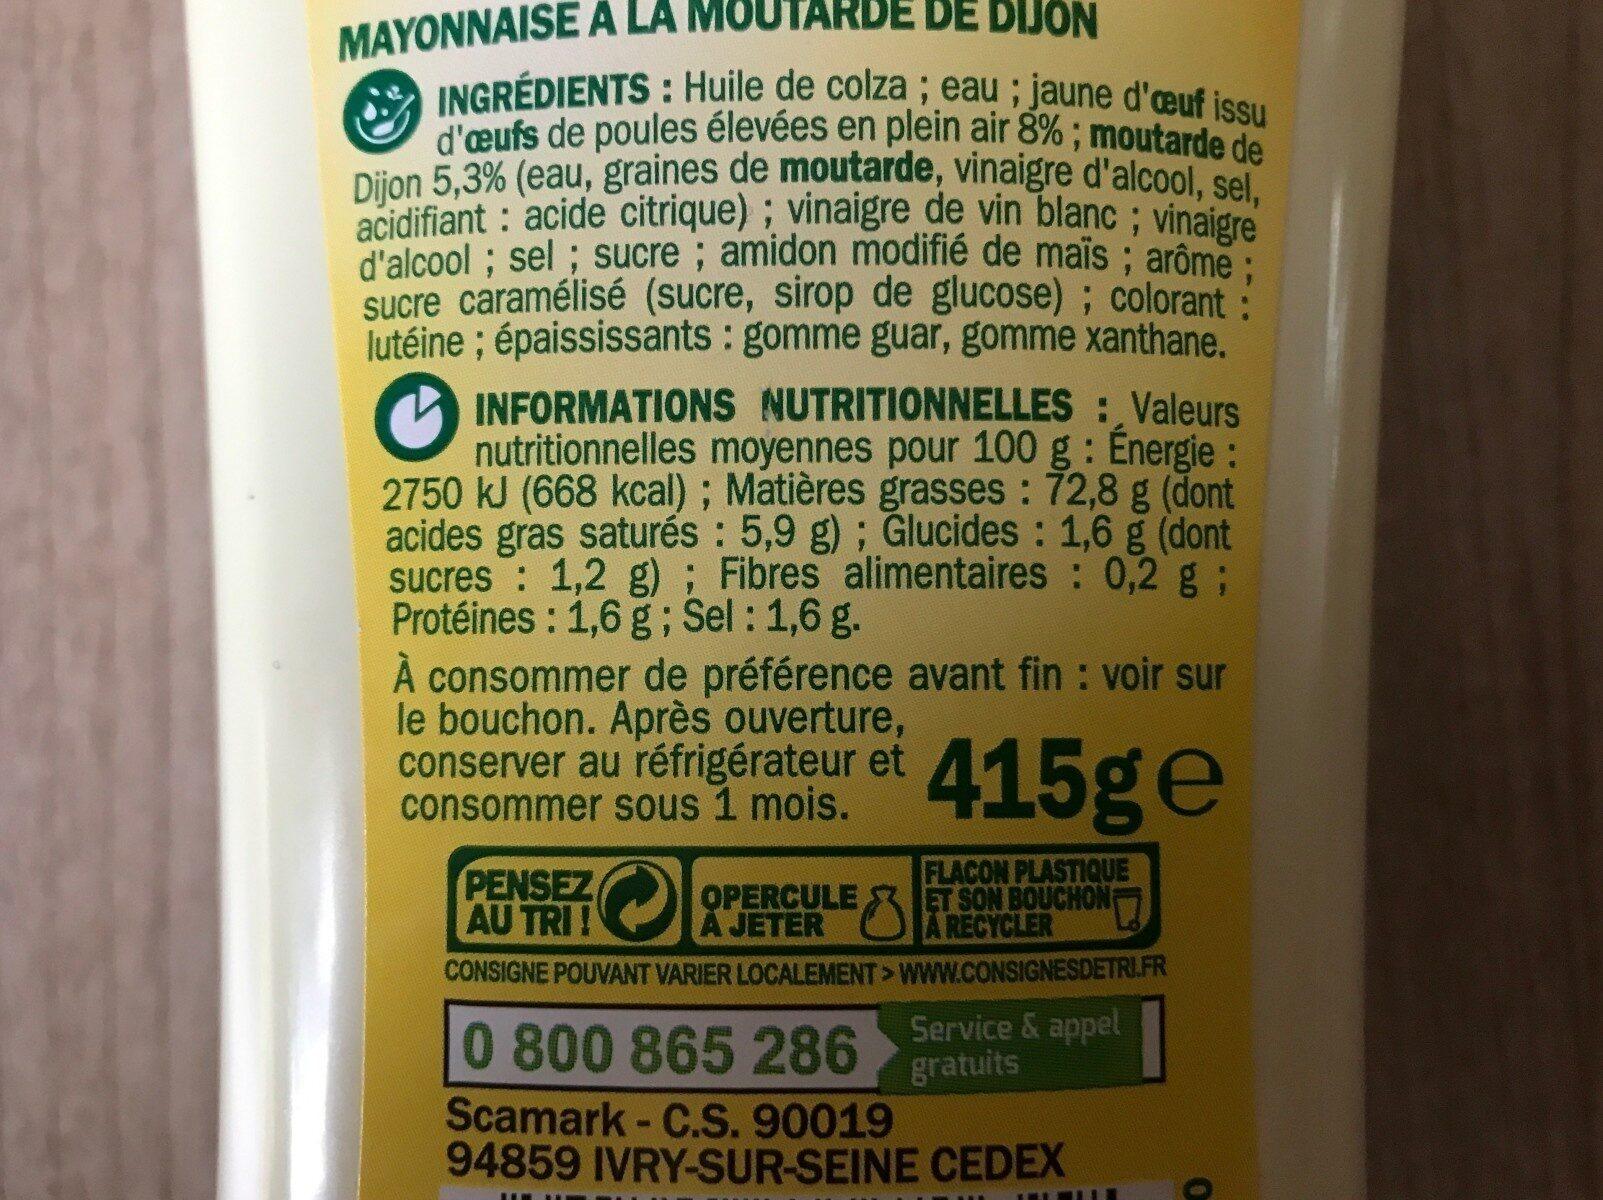 Mayonnaise à la moutarde de Dijon - Valori nutrizionali - fr